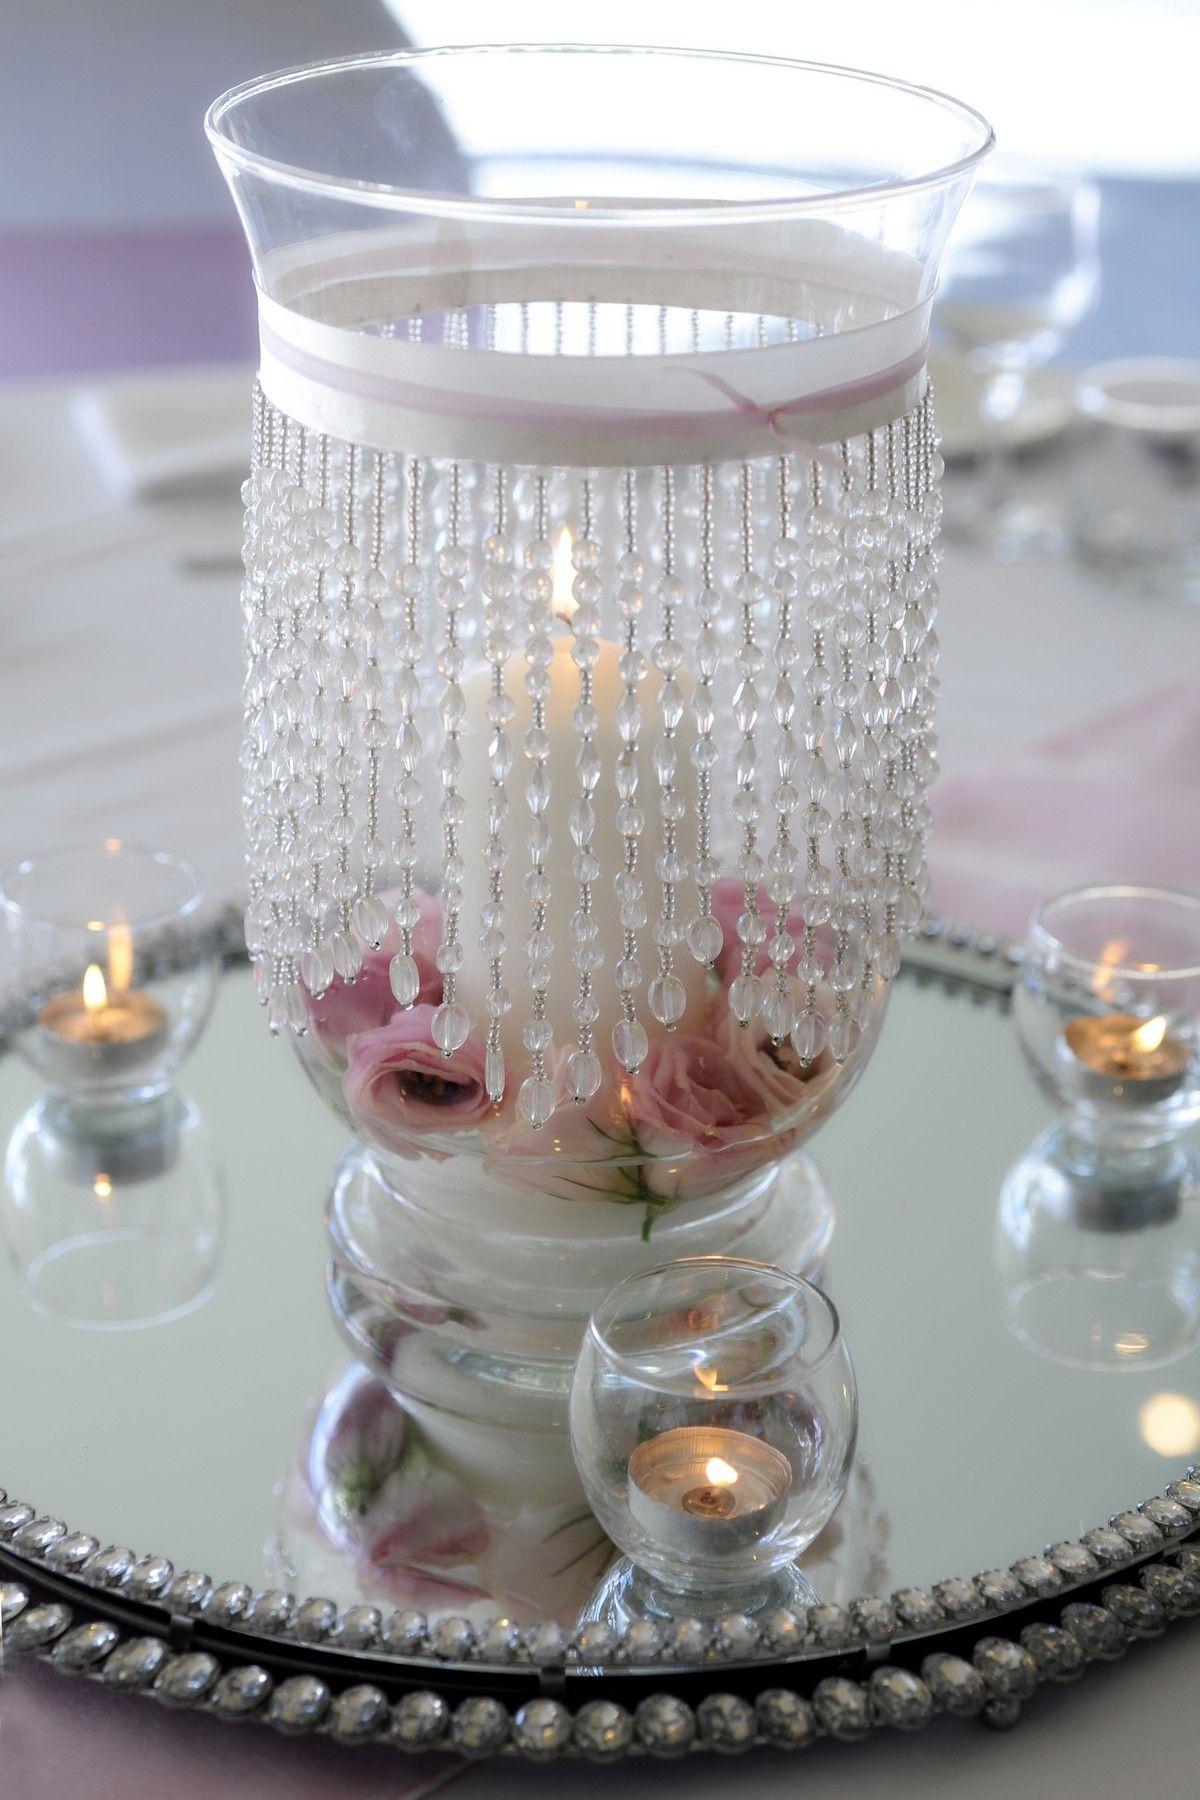 Hurricane vase wedding centerpieces pinterest